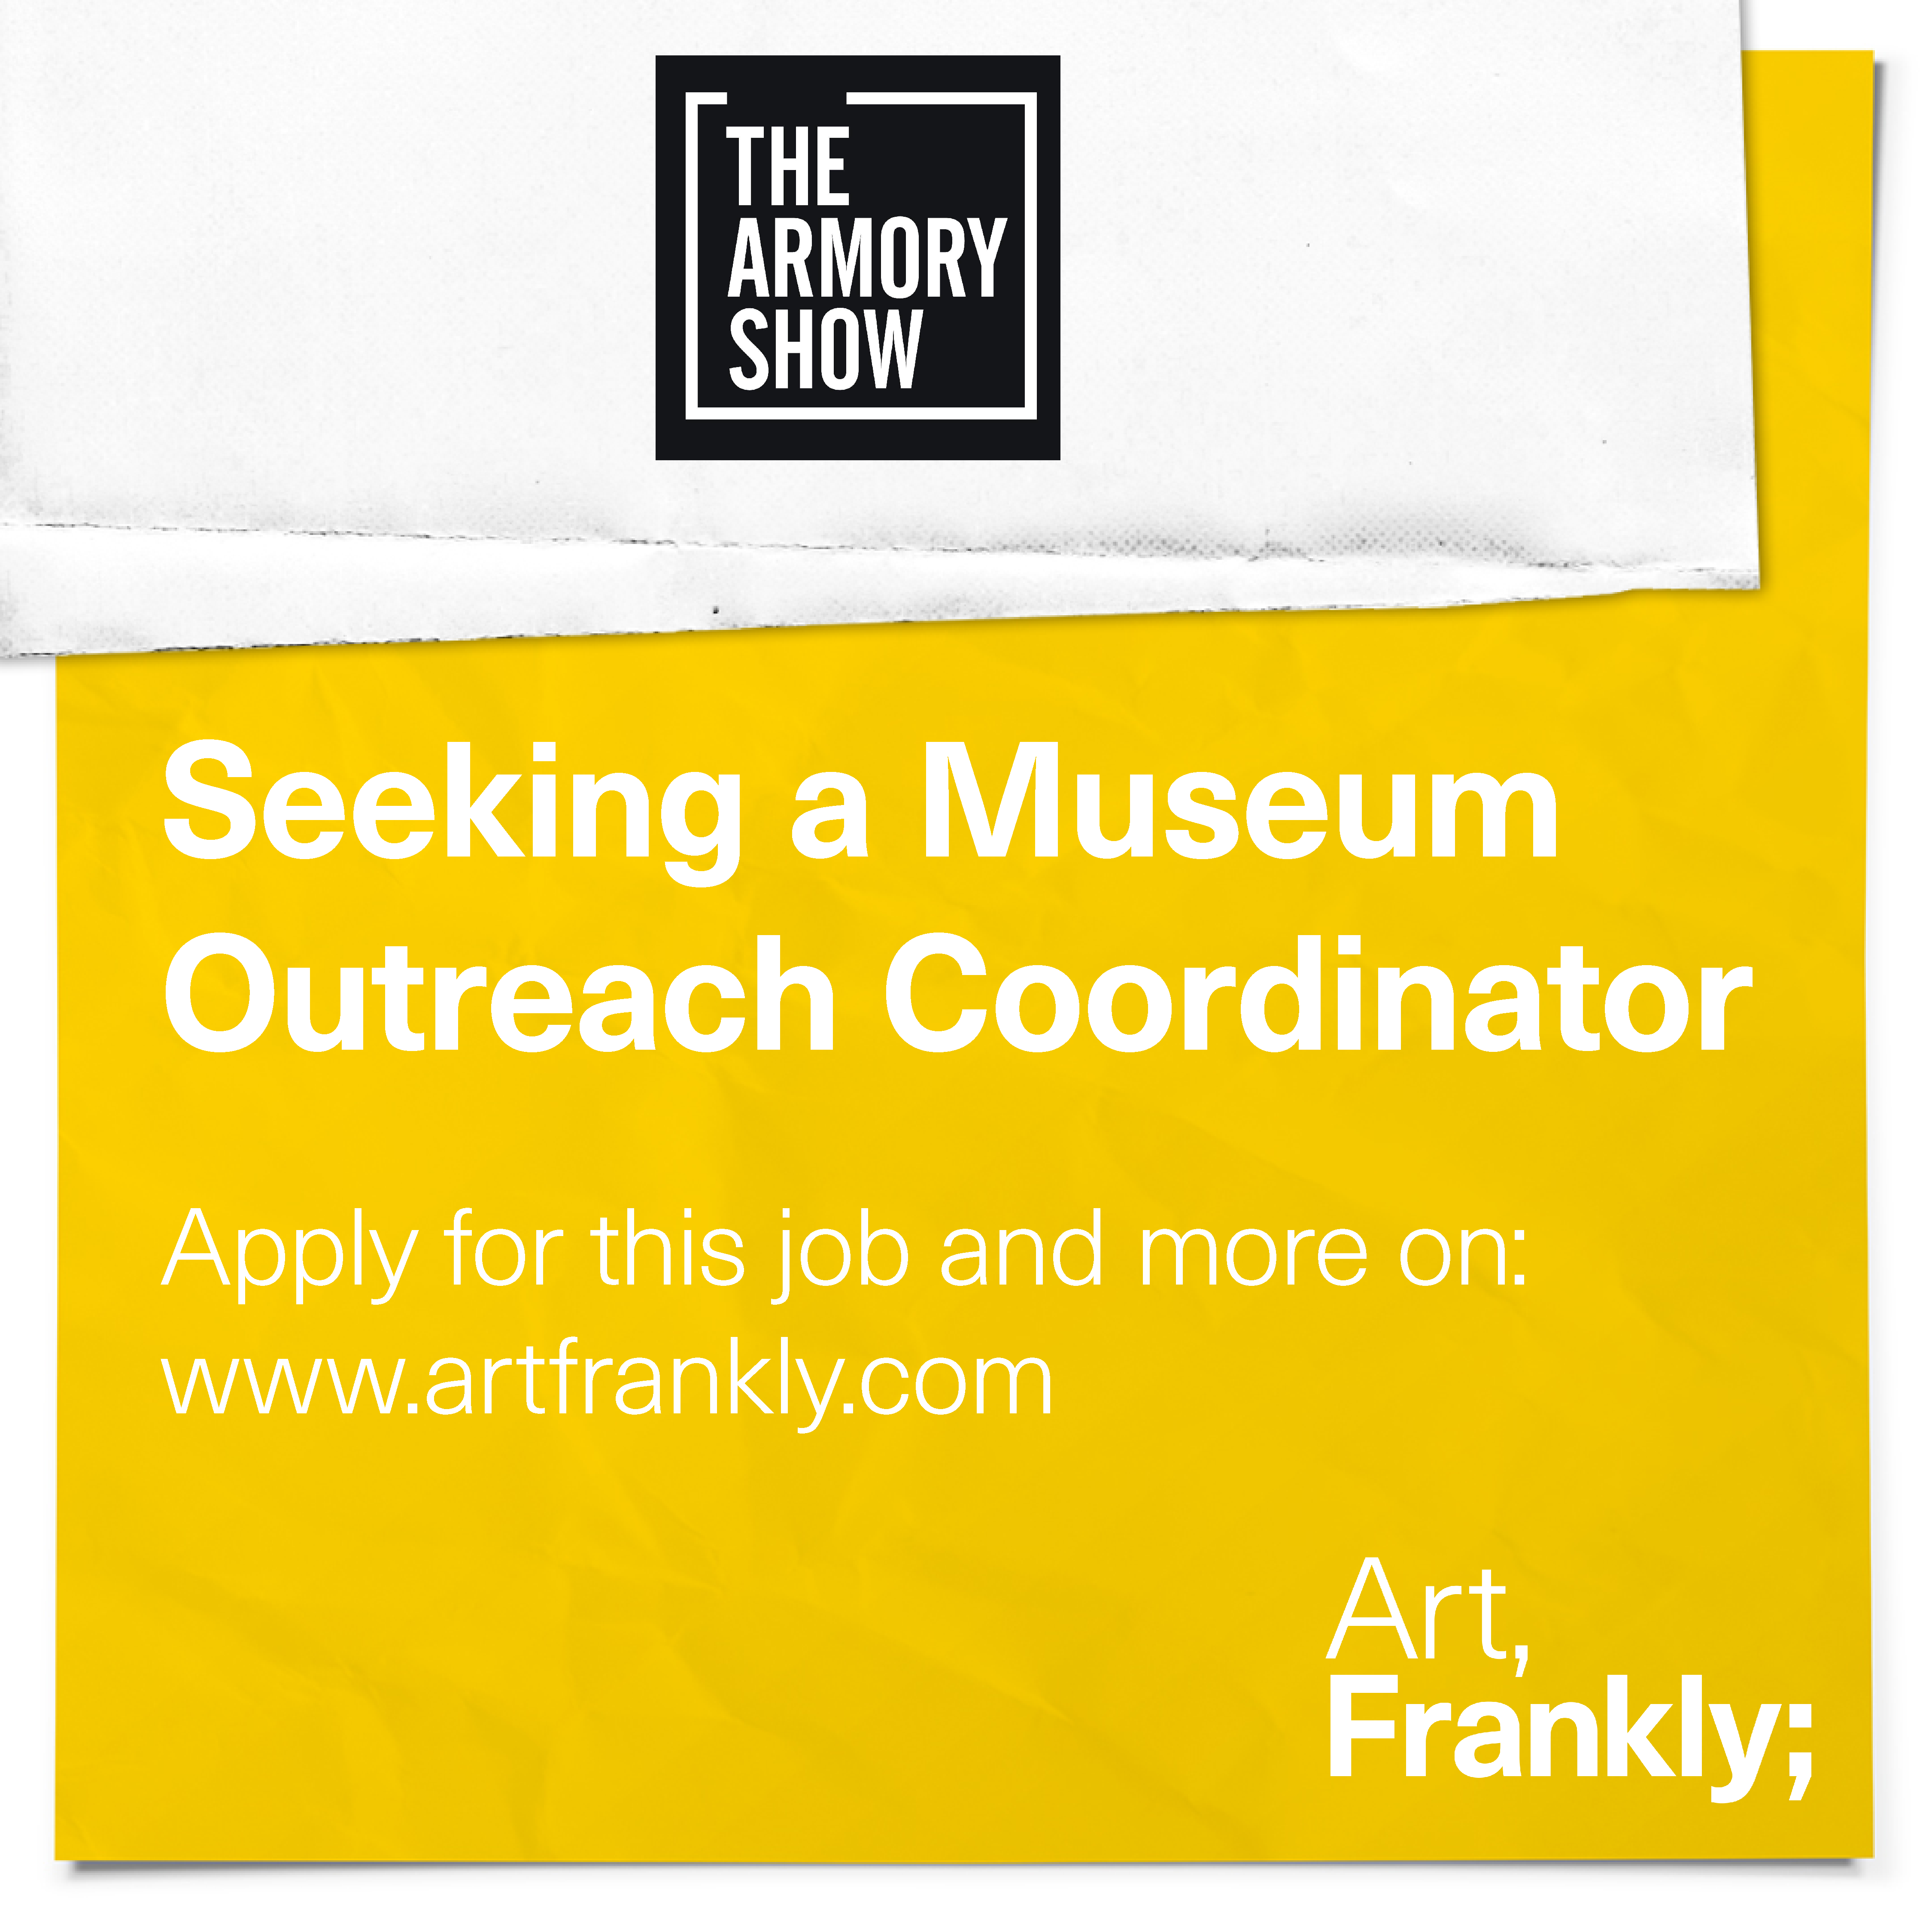 The Armory Show Museum outreach coordinator